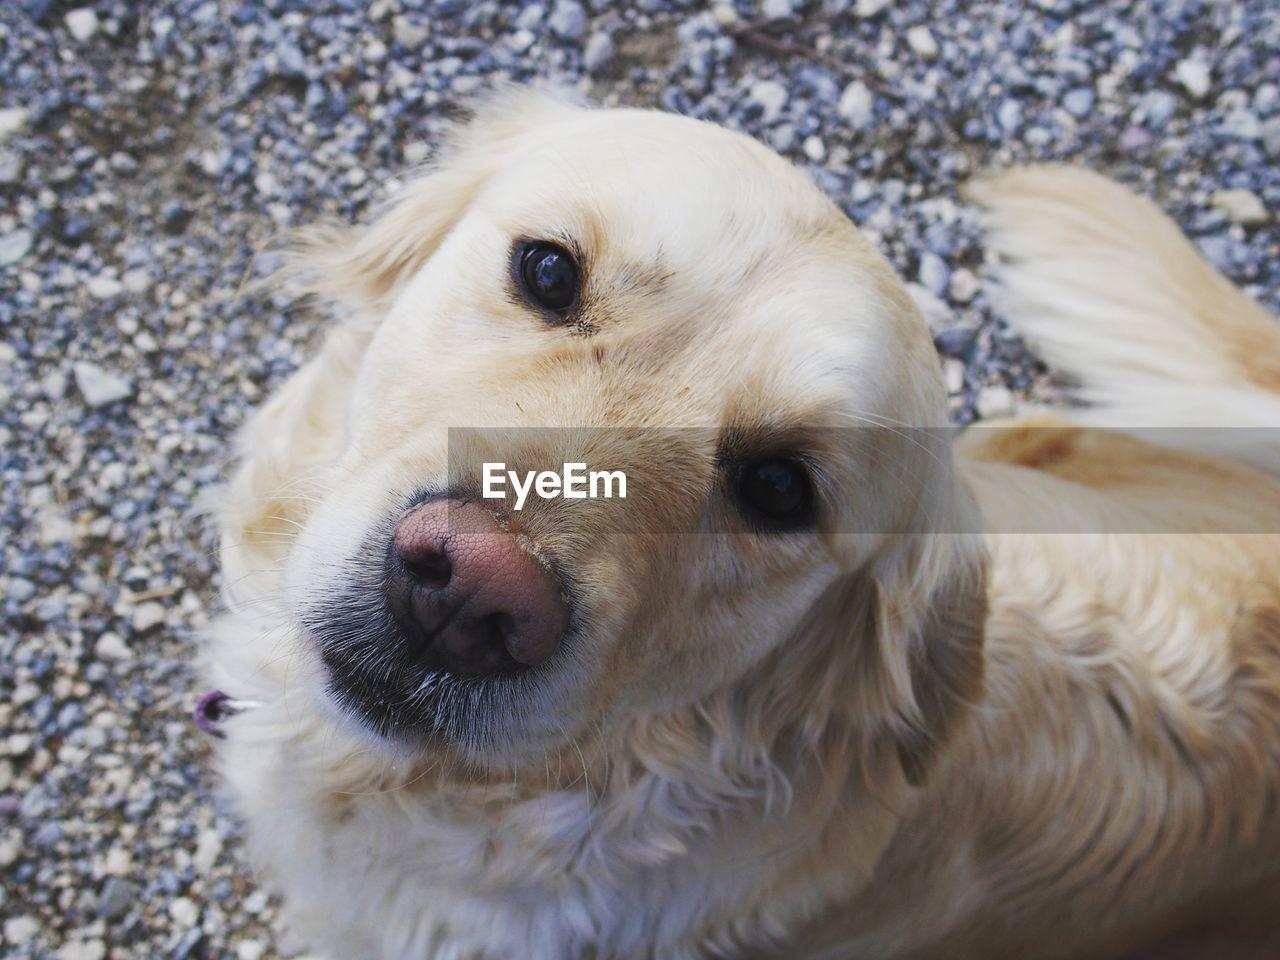 Directly above portrait shot of dog